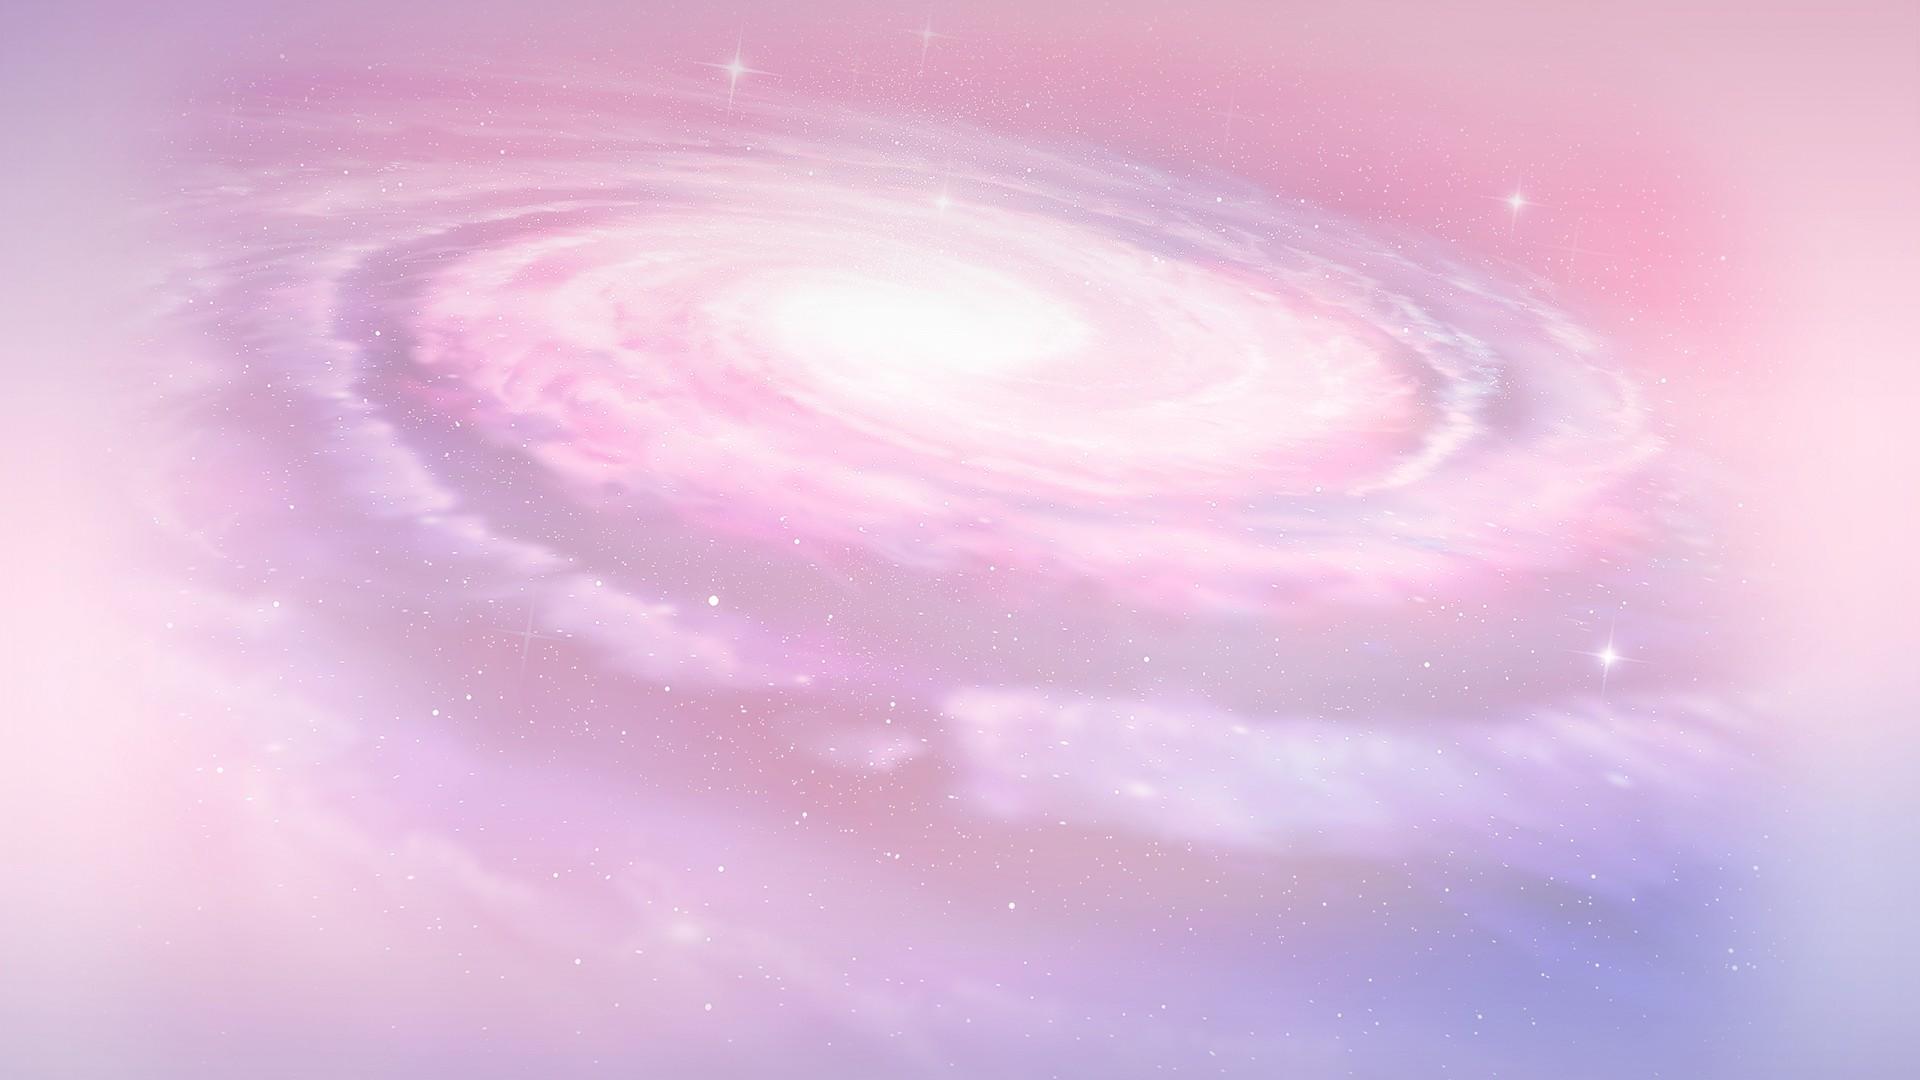 3d Galaxy Wallpaper Widescreen Milky Way Galaxy Wallpapers Hd Wallpapers Id 25001